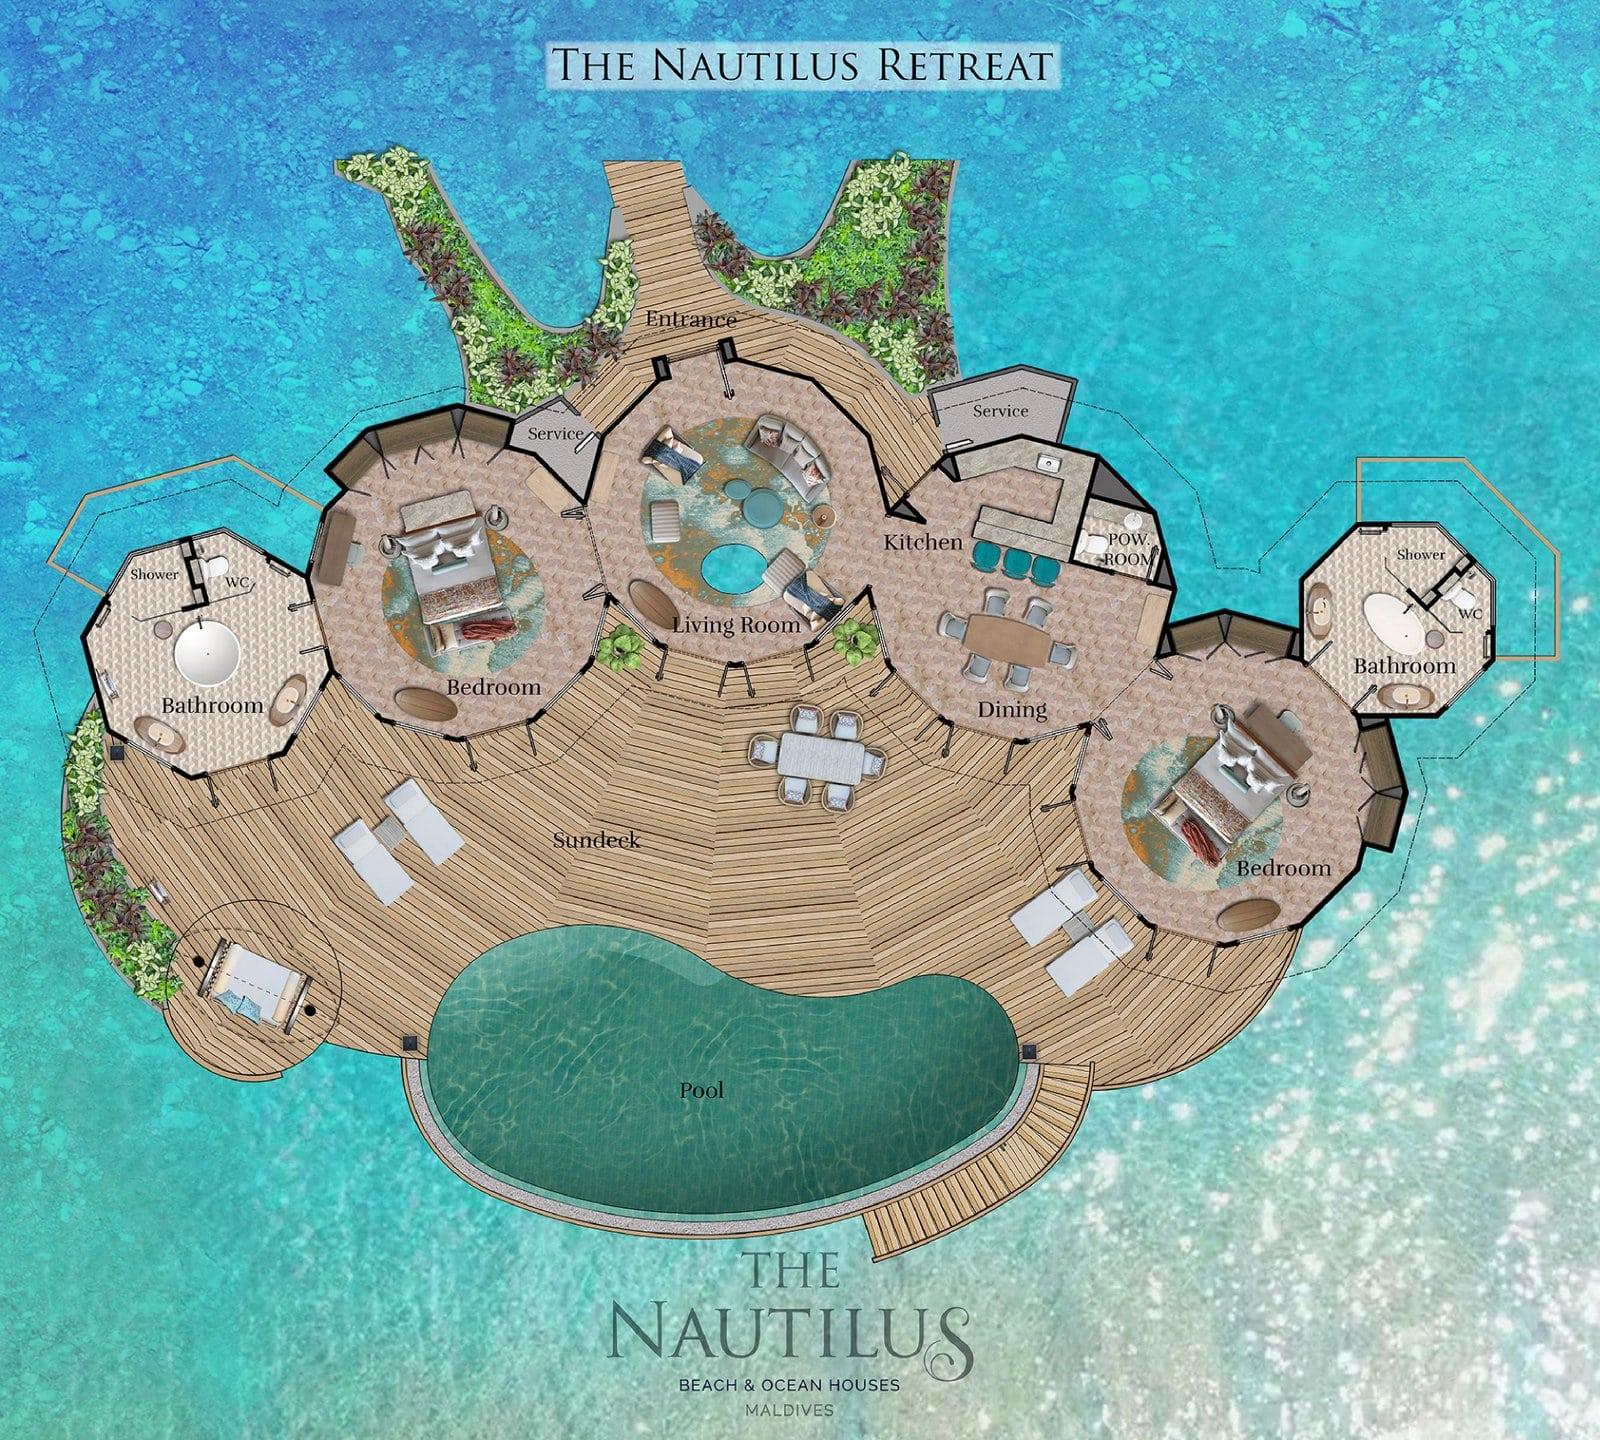 Мальдивы, отель The Nautilus Maldives, план-схема номера Two-Bedroom The Nautilus Retreat